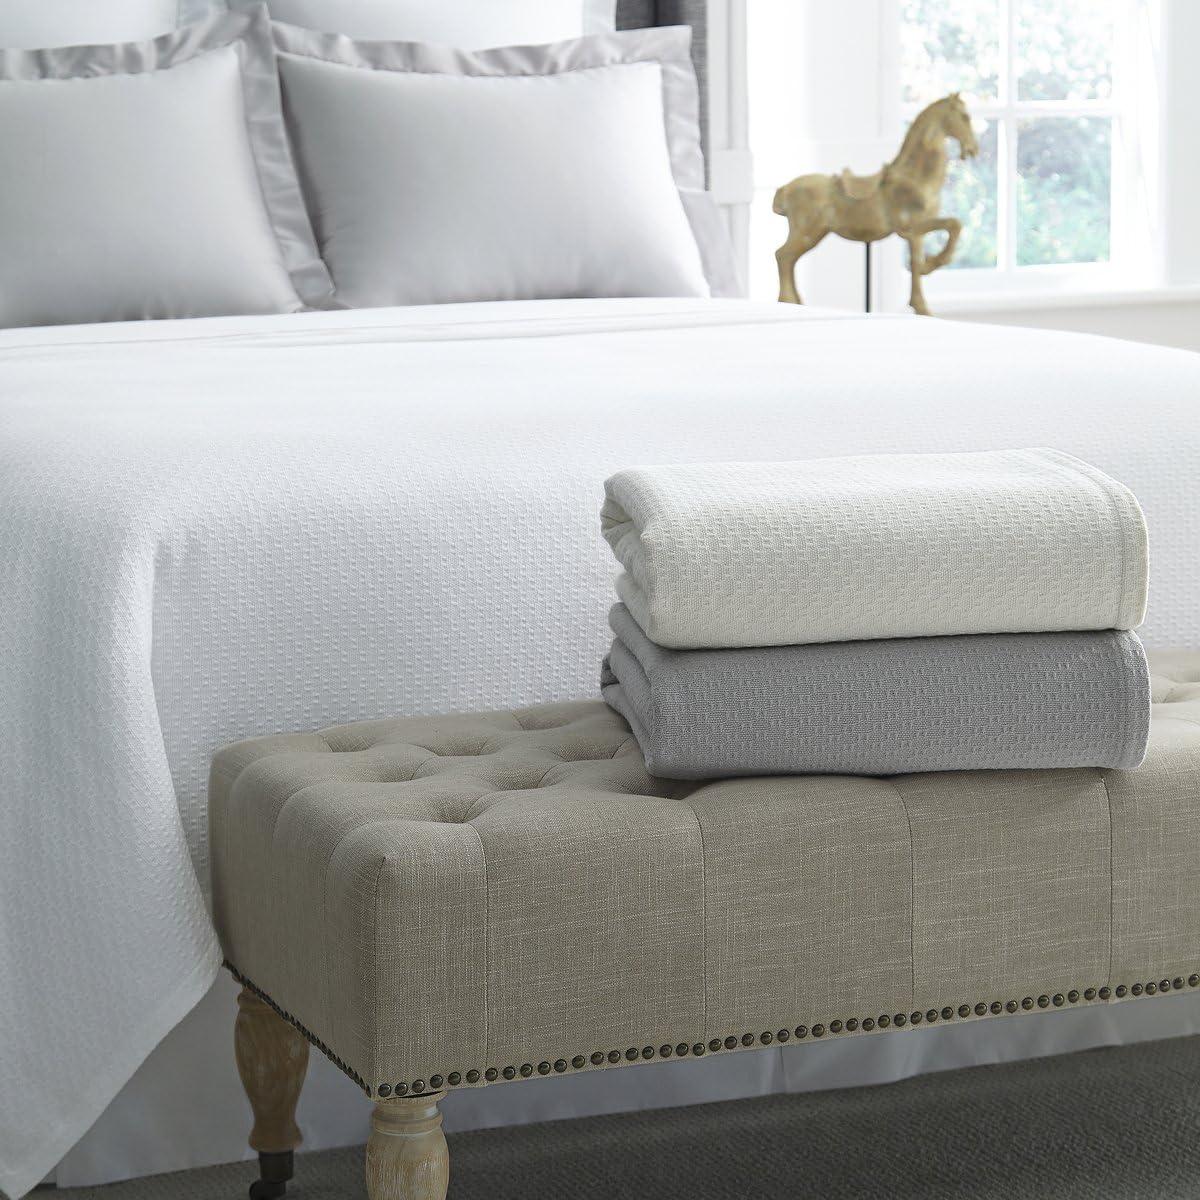 Corino Blanket by Sferra – アイボリー Full/Queen Blanket 100x100